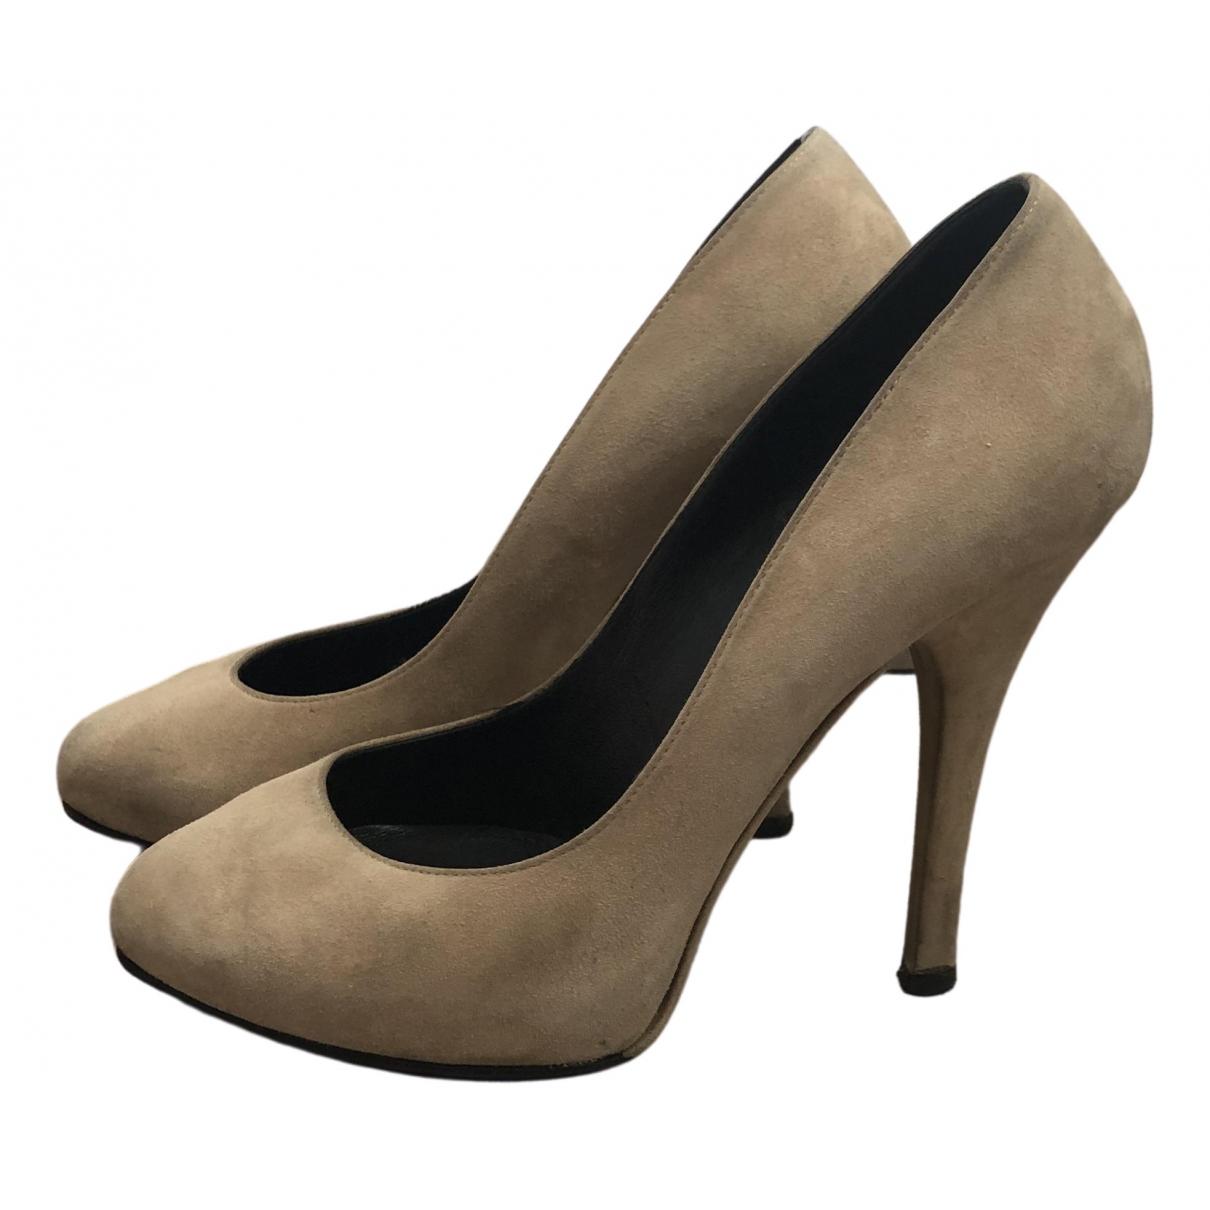 Dolce & Gabbana \N Beige Suede Heels for Women 39 EU